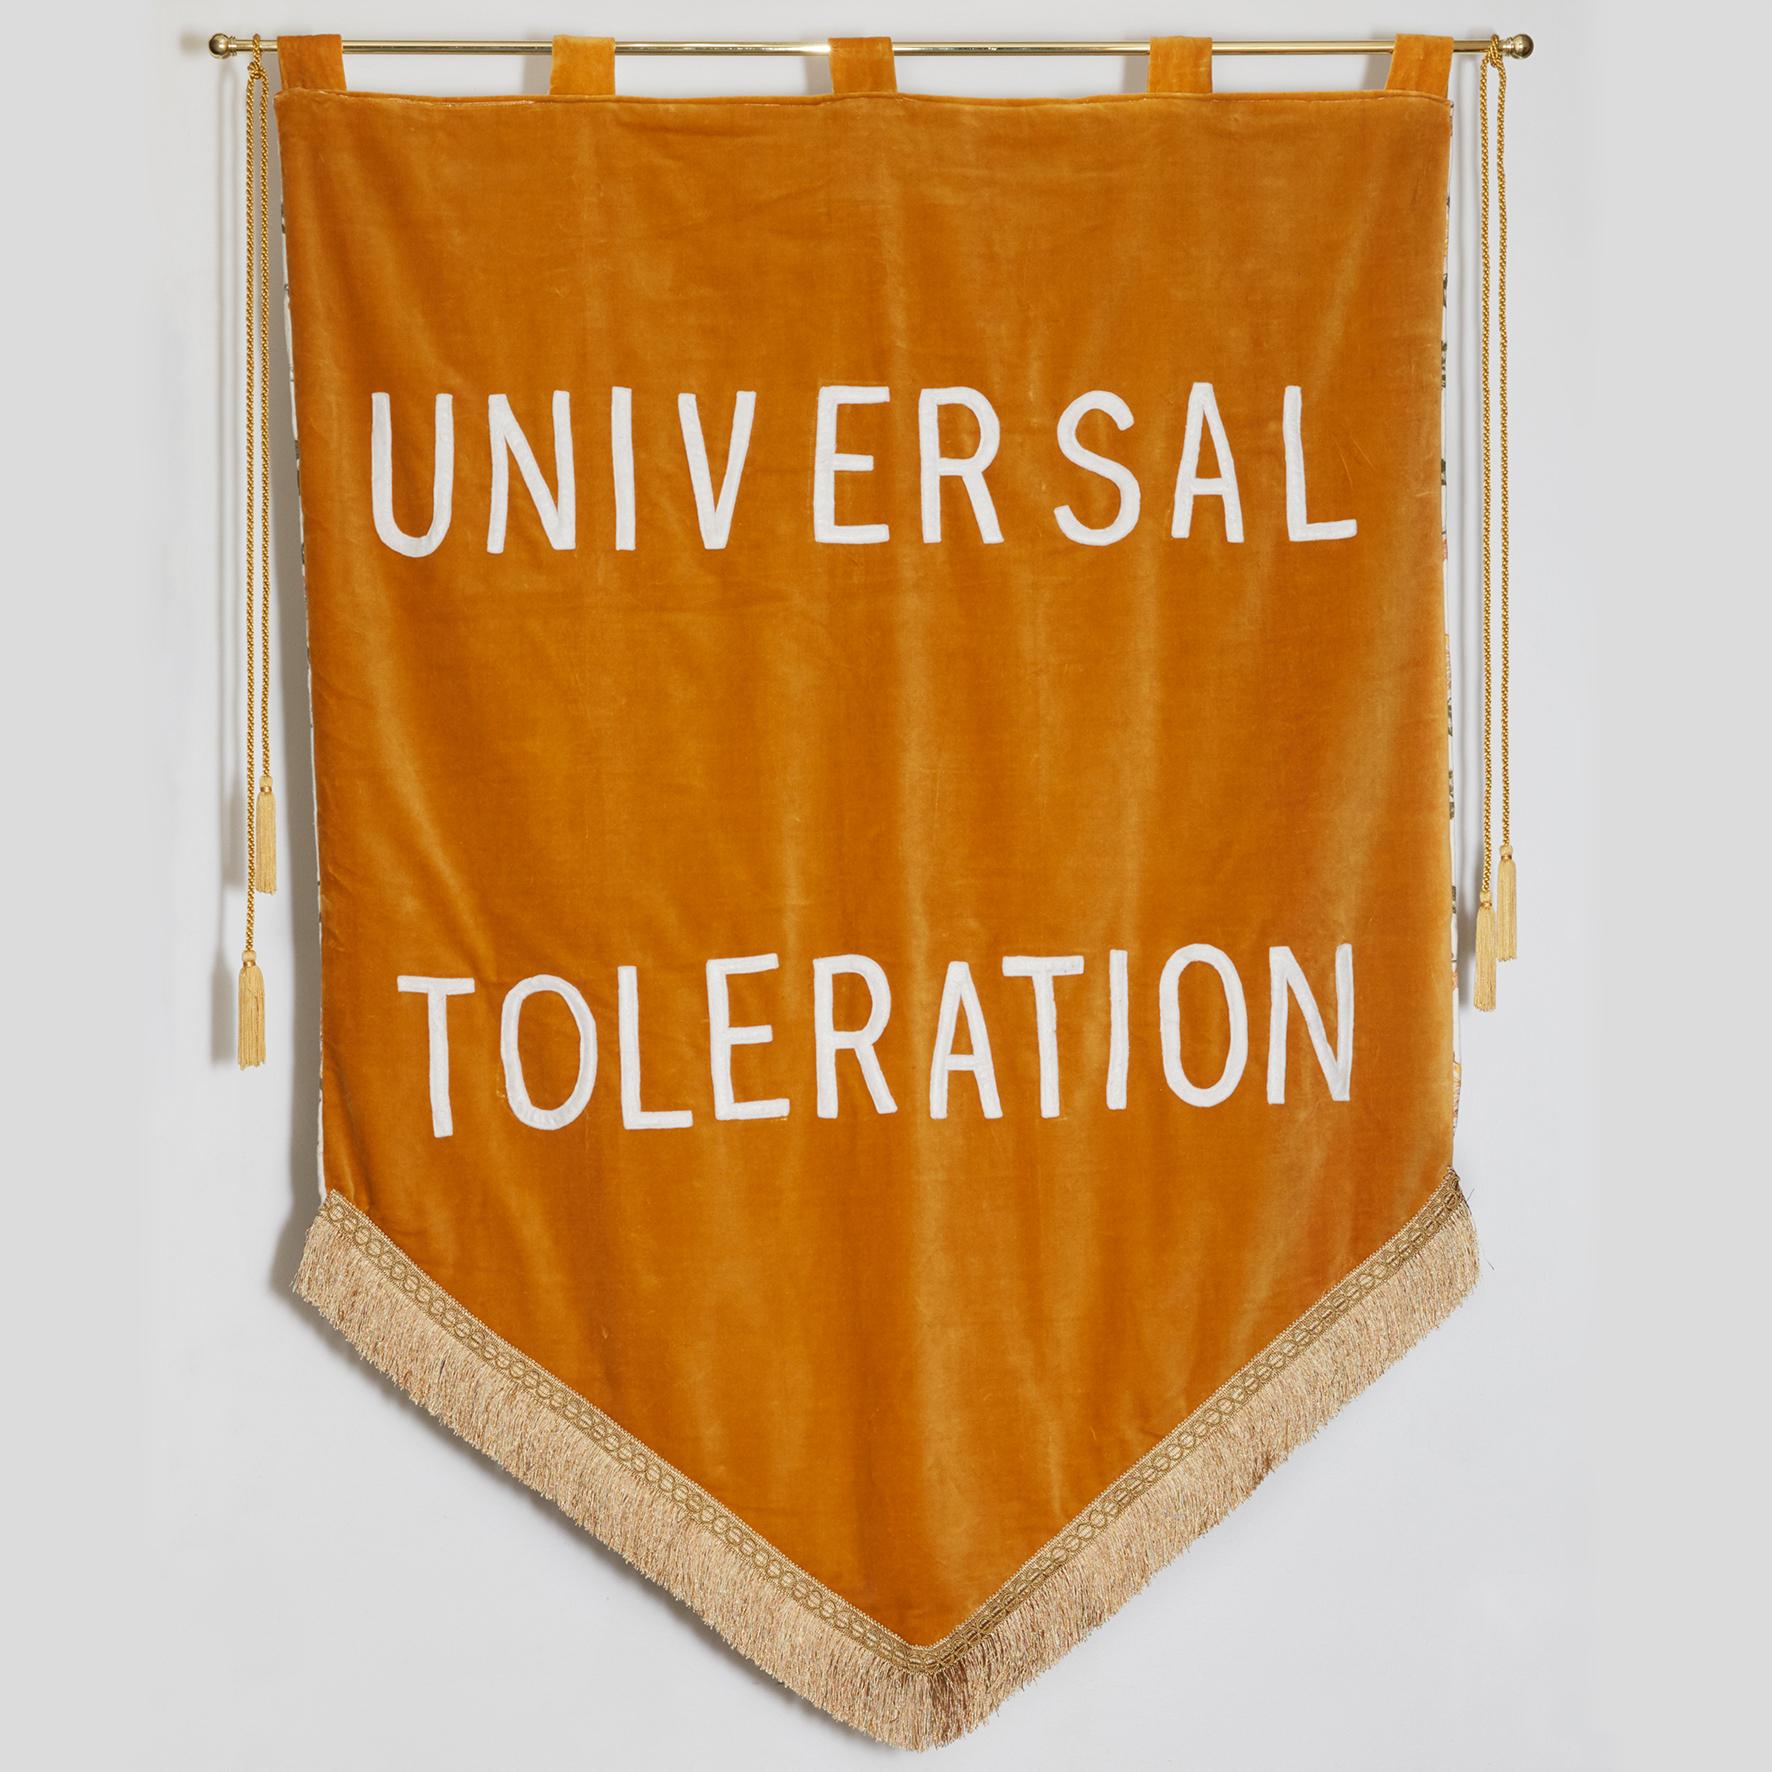 3.universal_.jpg